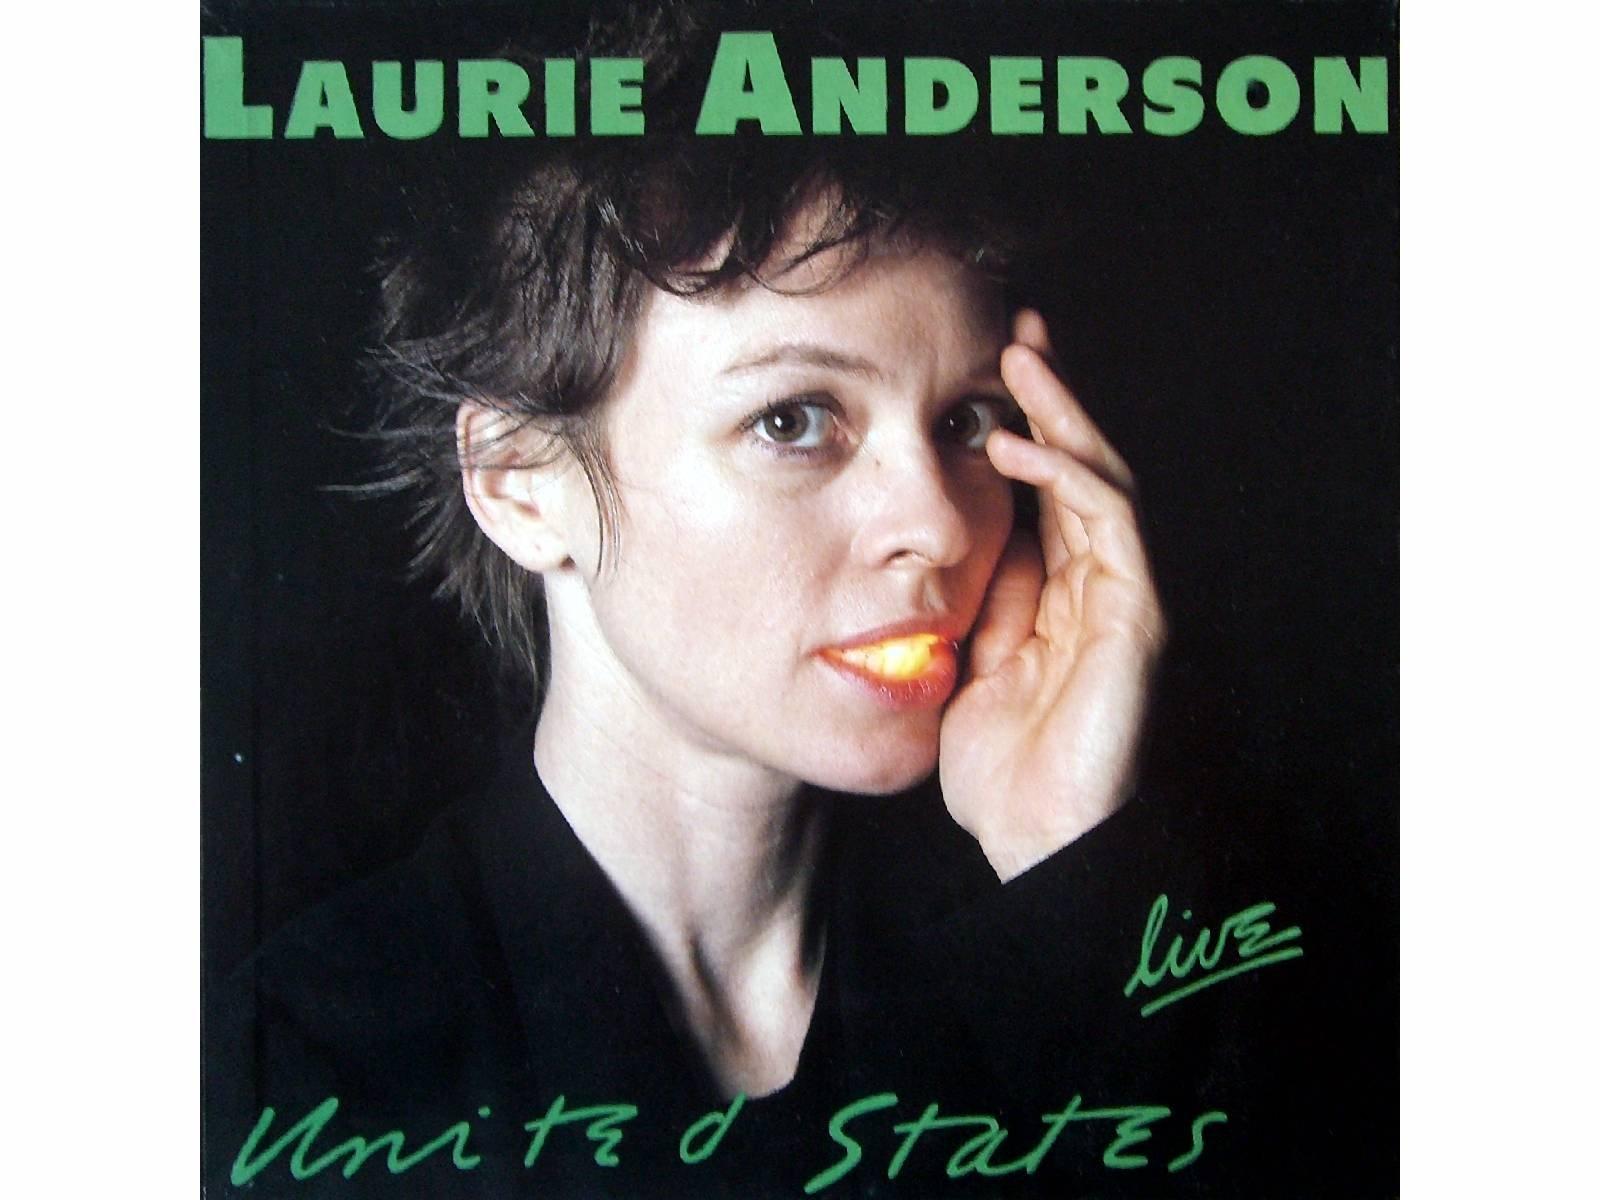 United States Live [Vinyl]